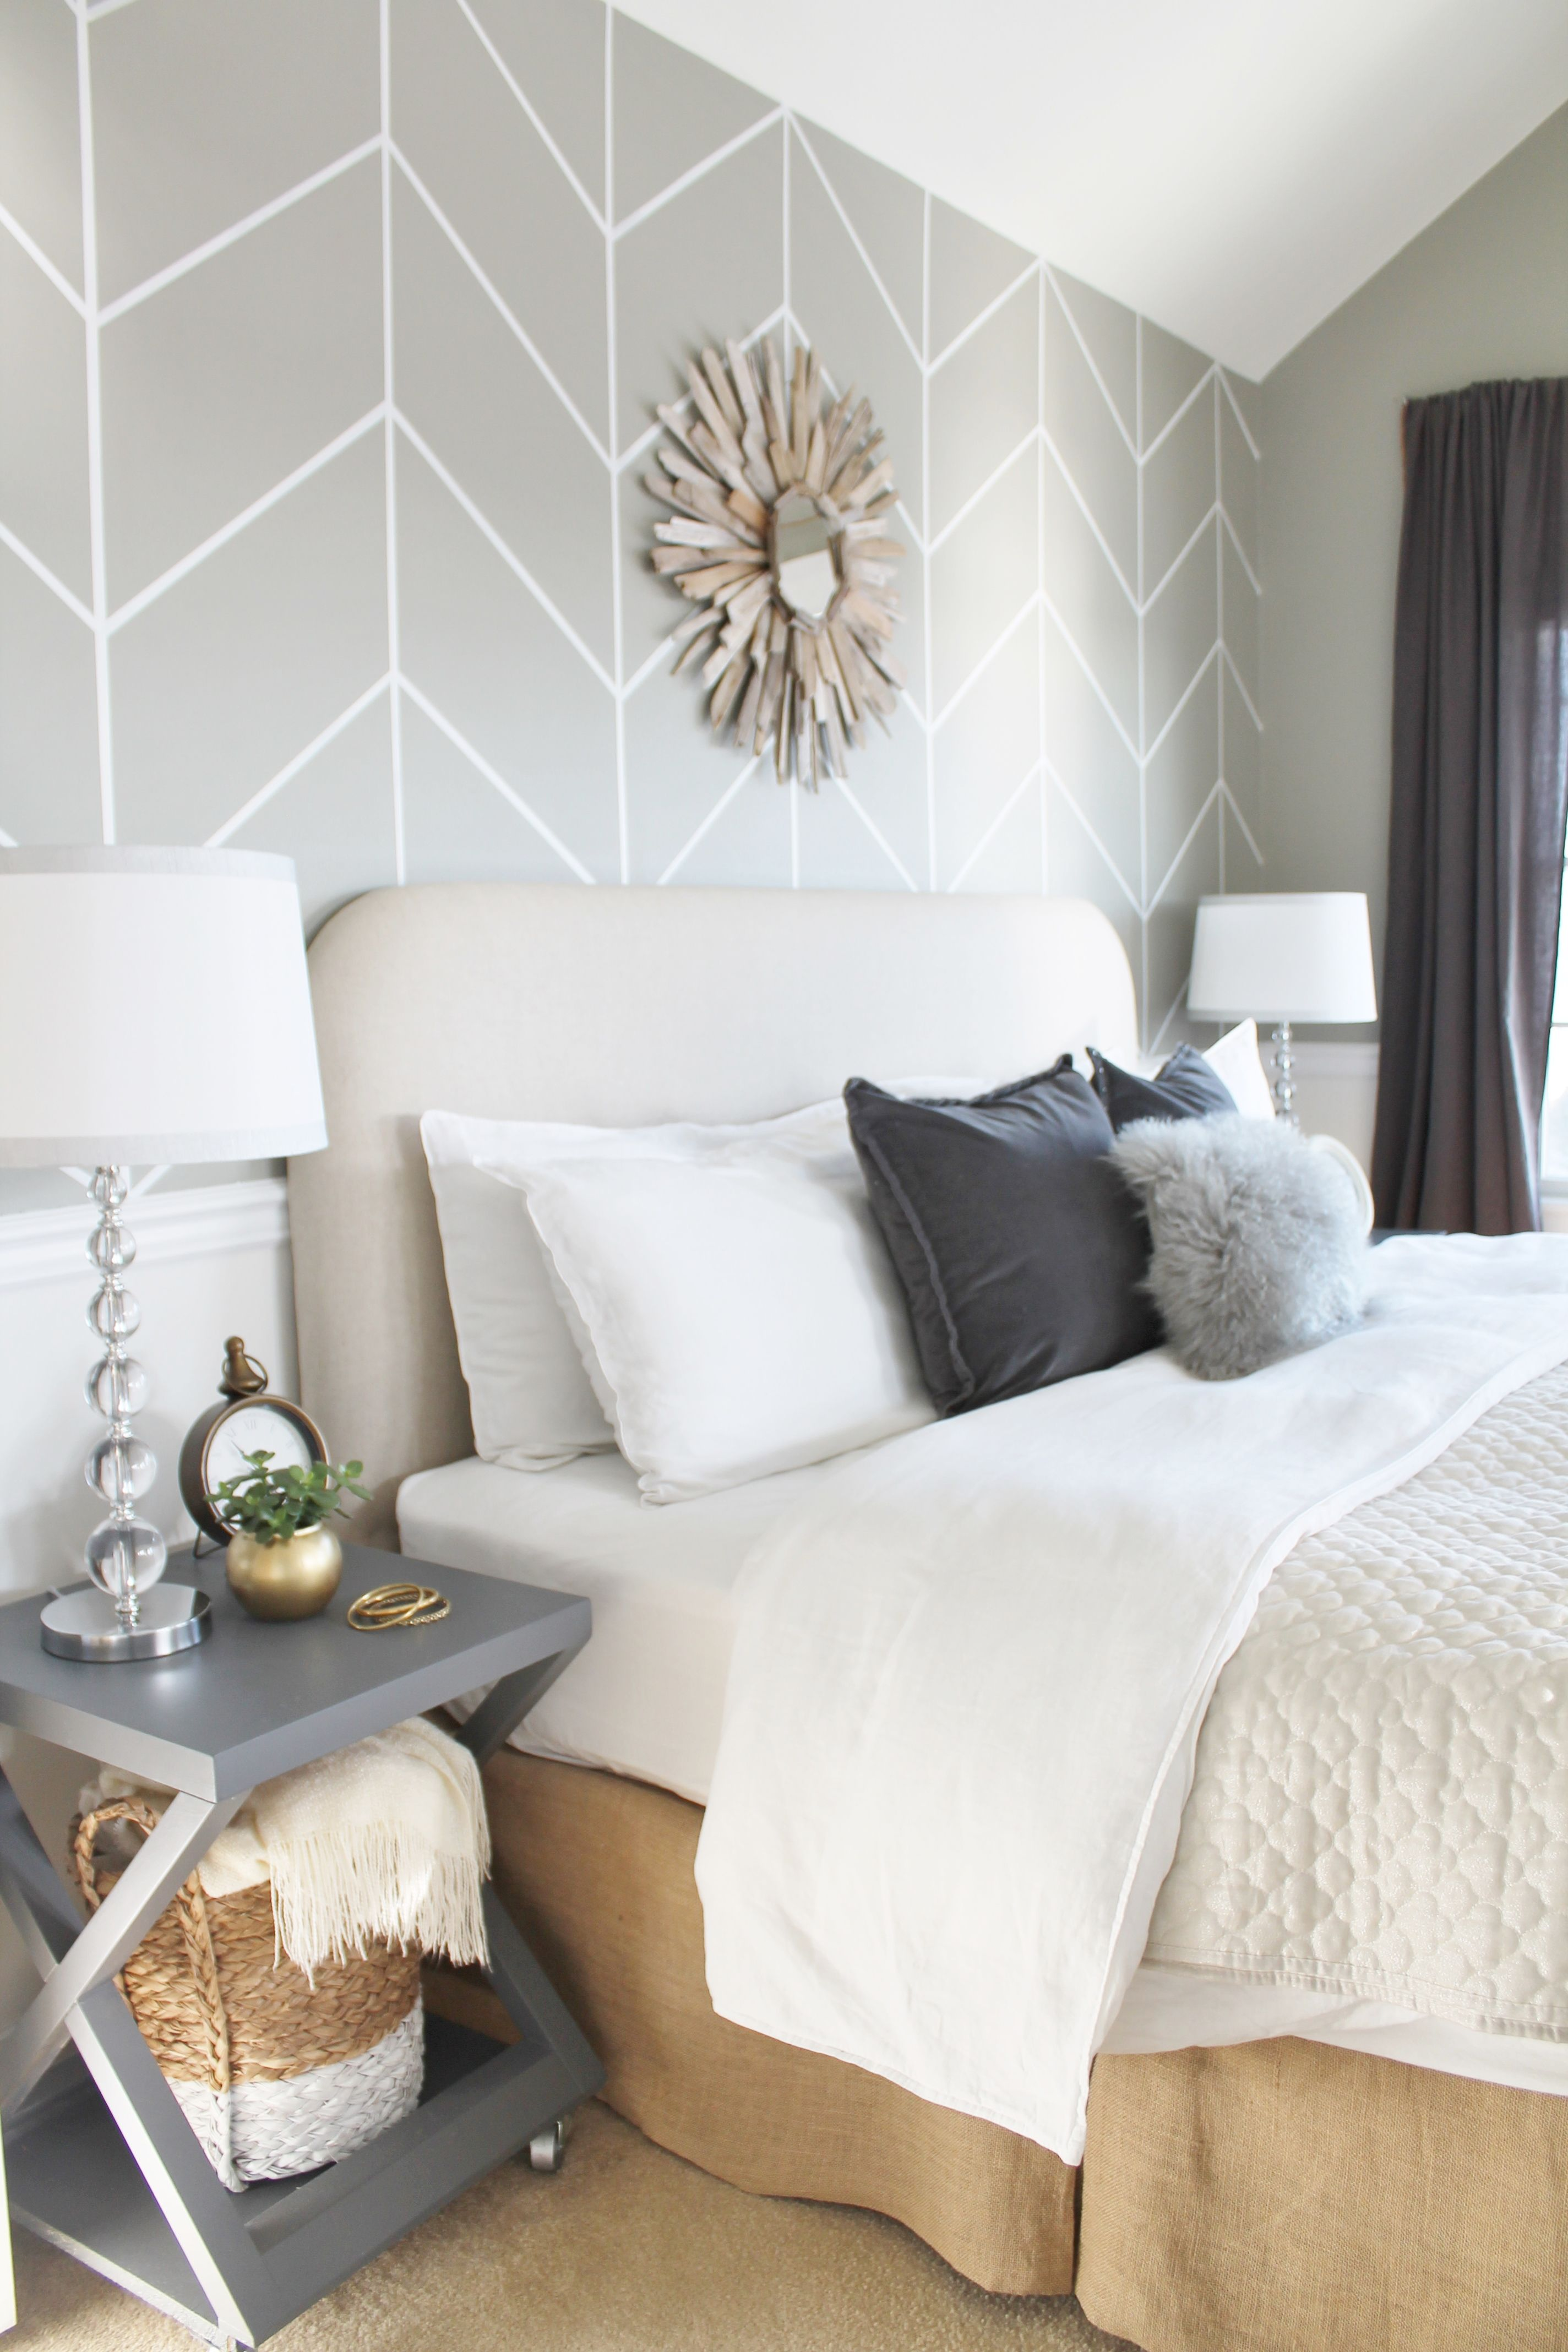 Feb-Bedroom-headboard-165.jpg 2,848×4,272 pixels